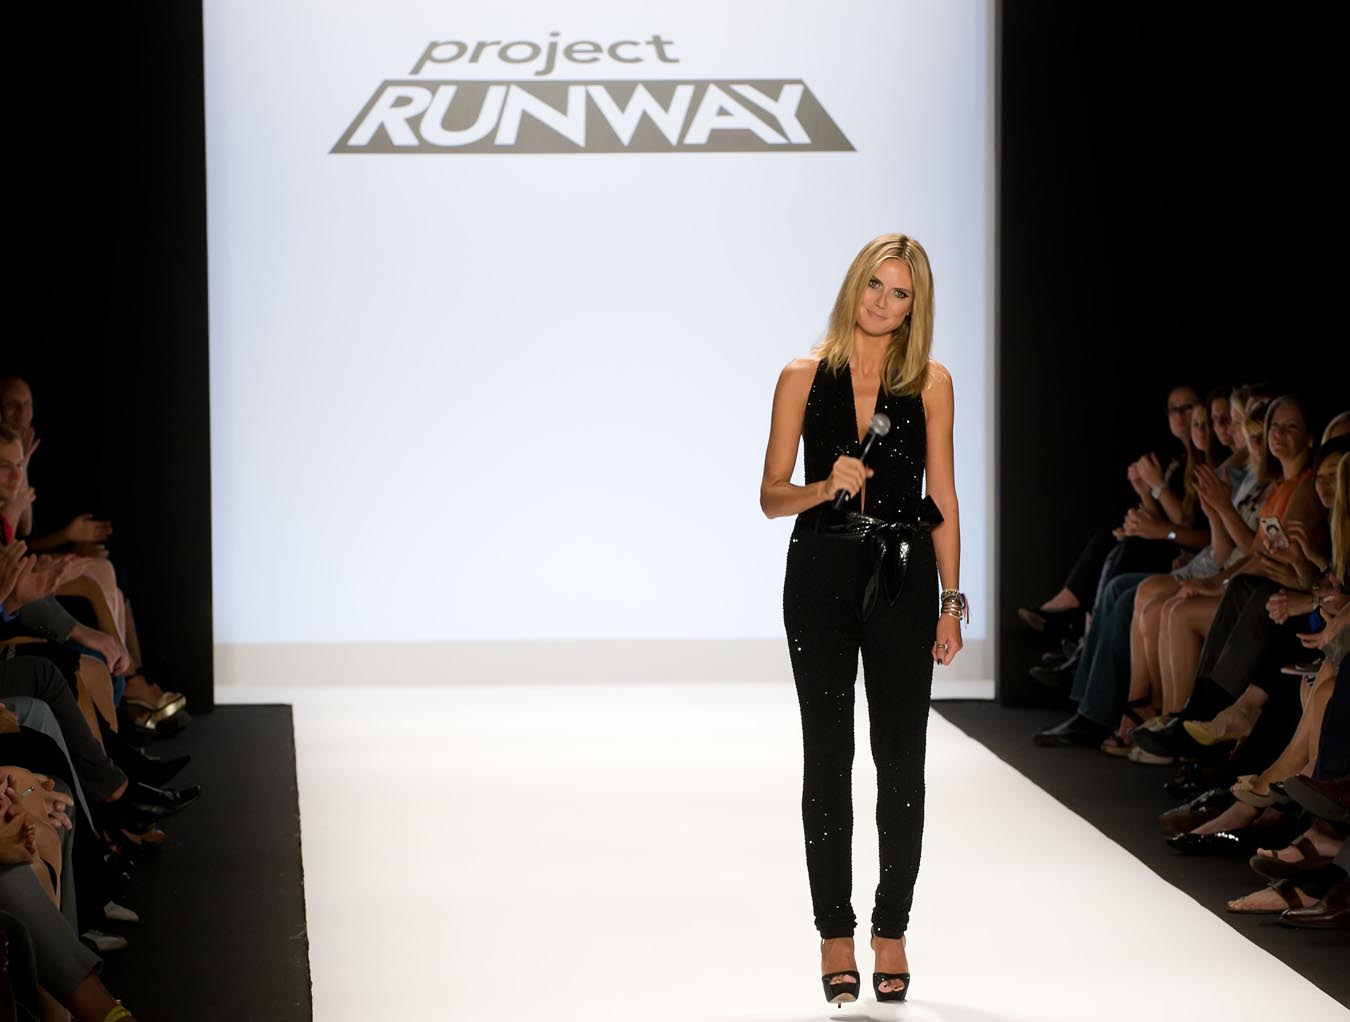 Heidi Klum Project Runway